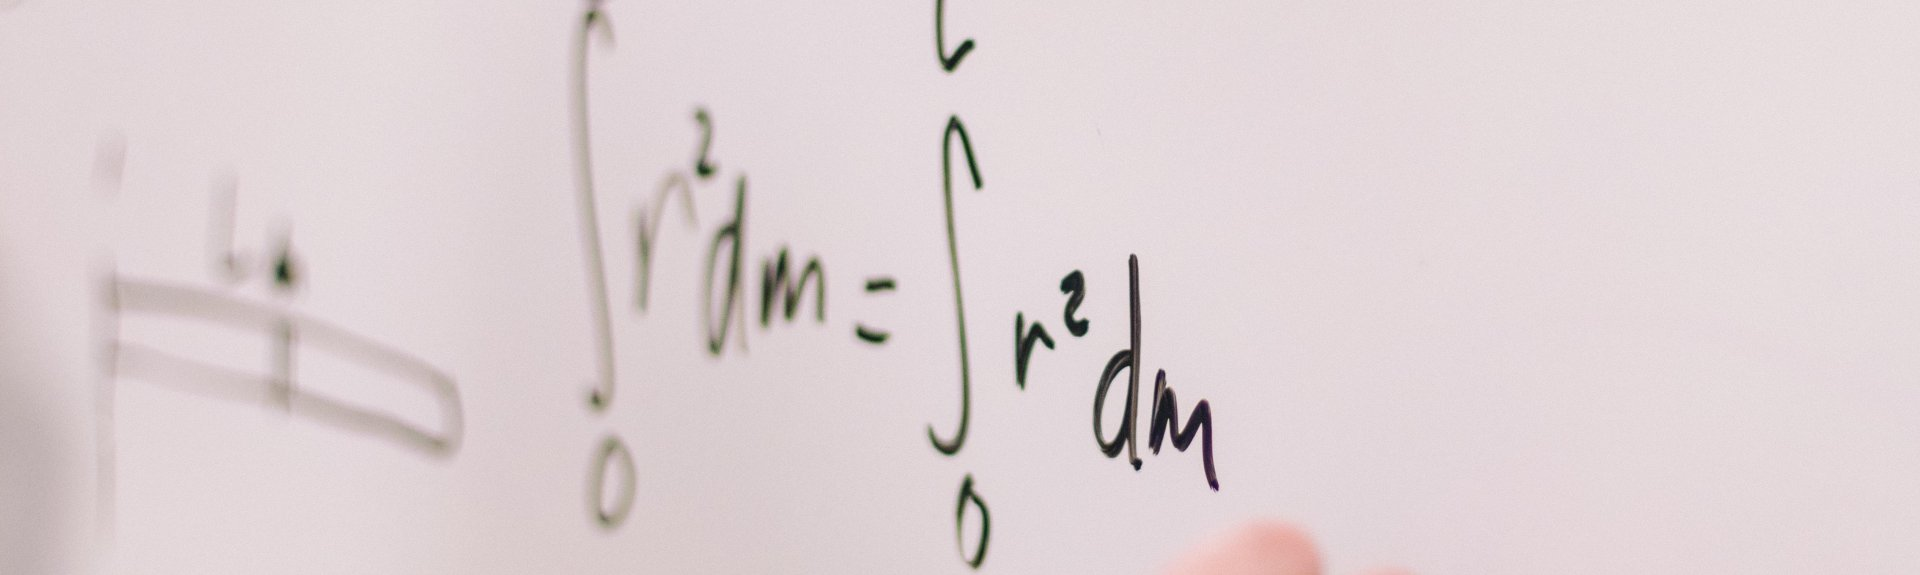 Matematikskole